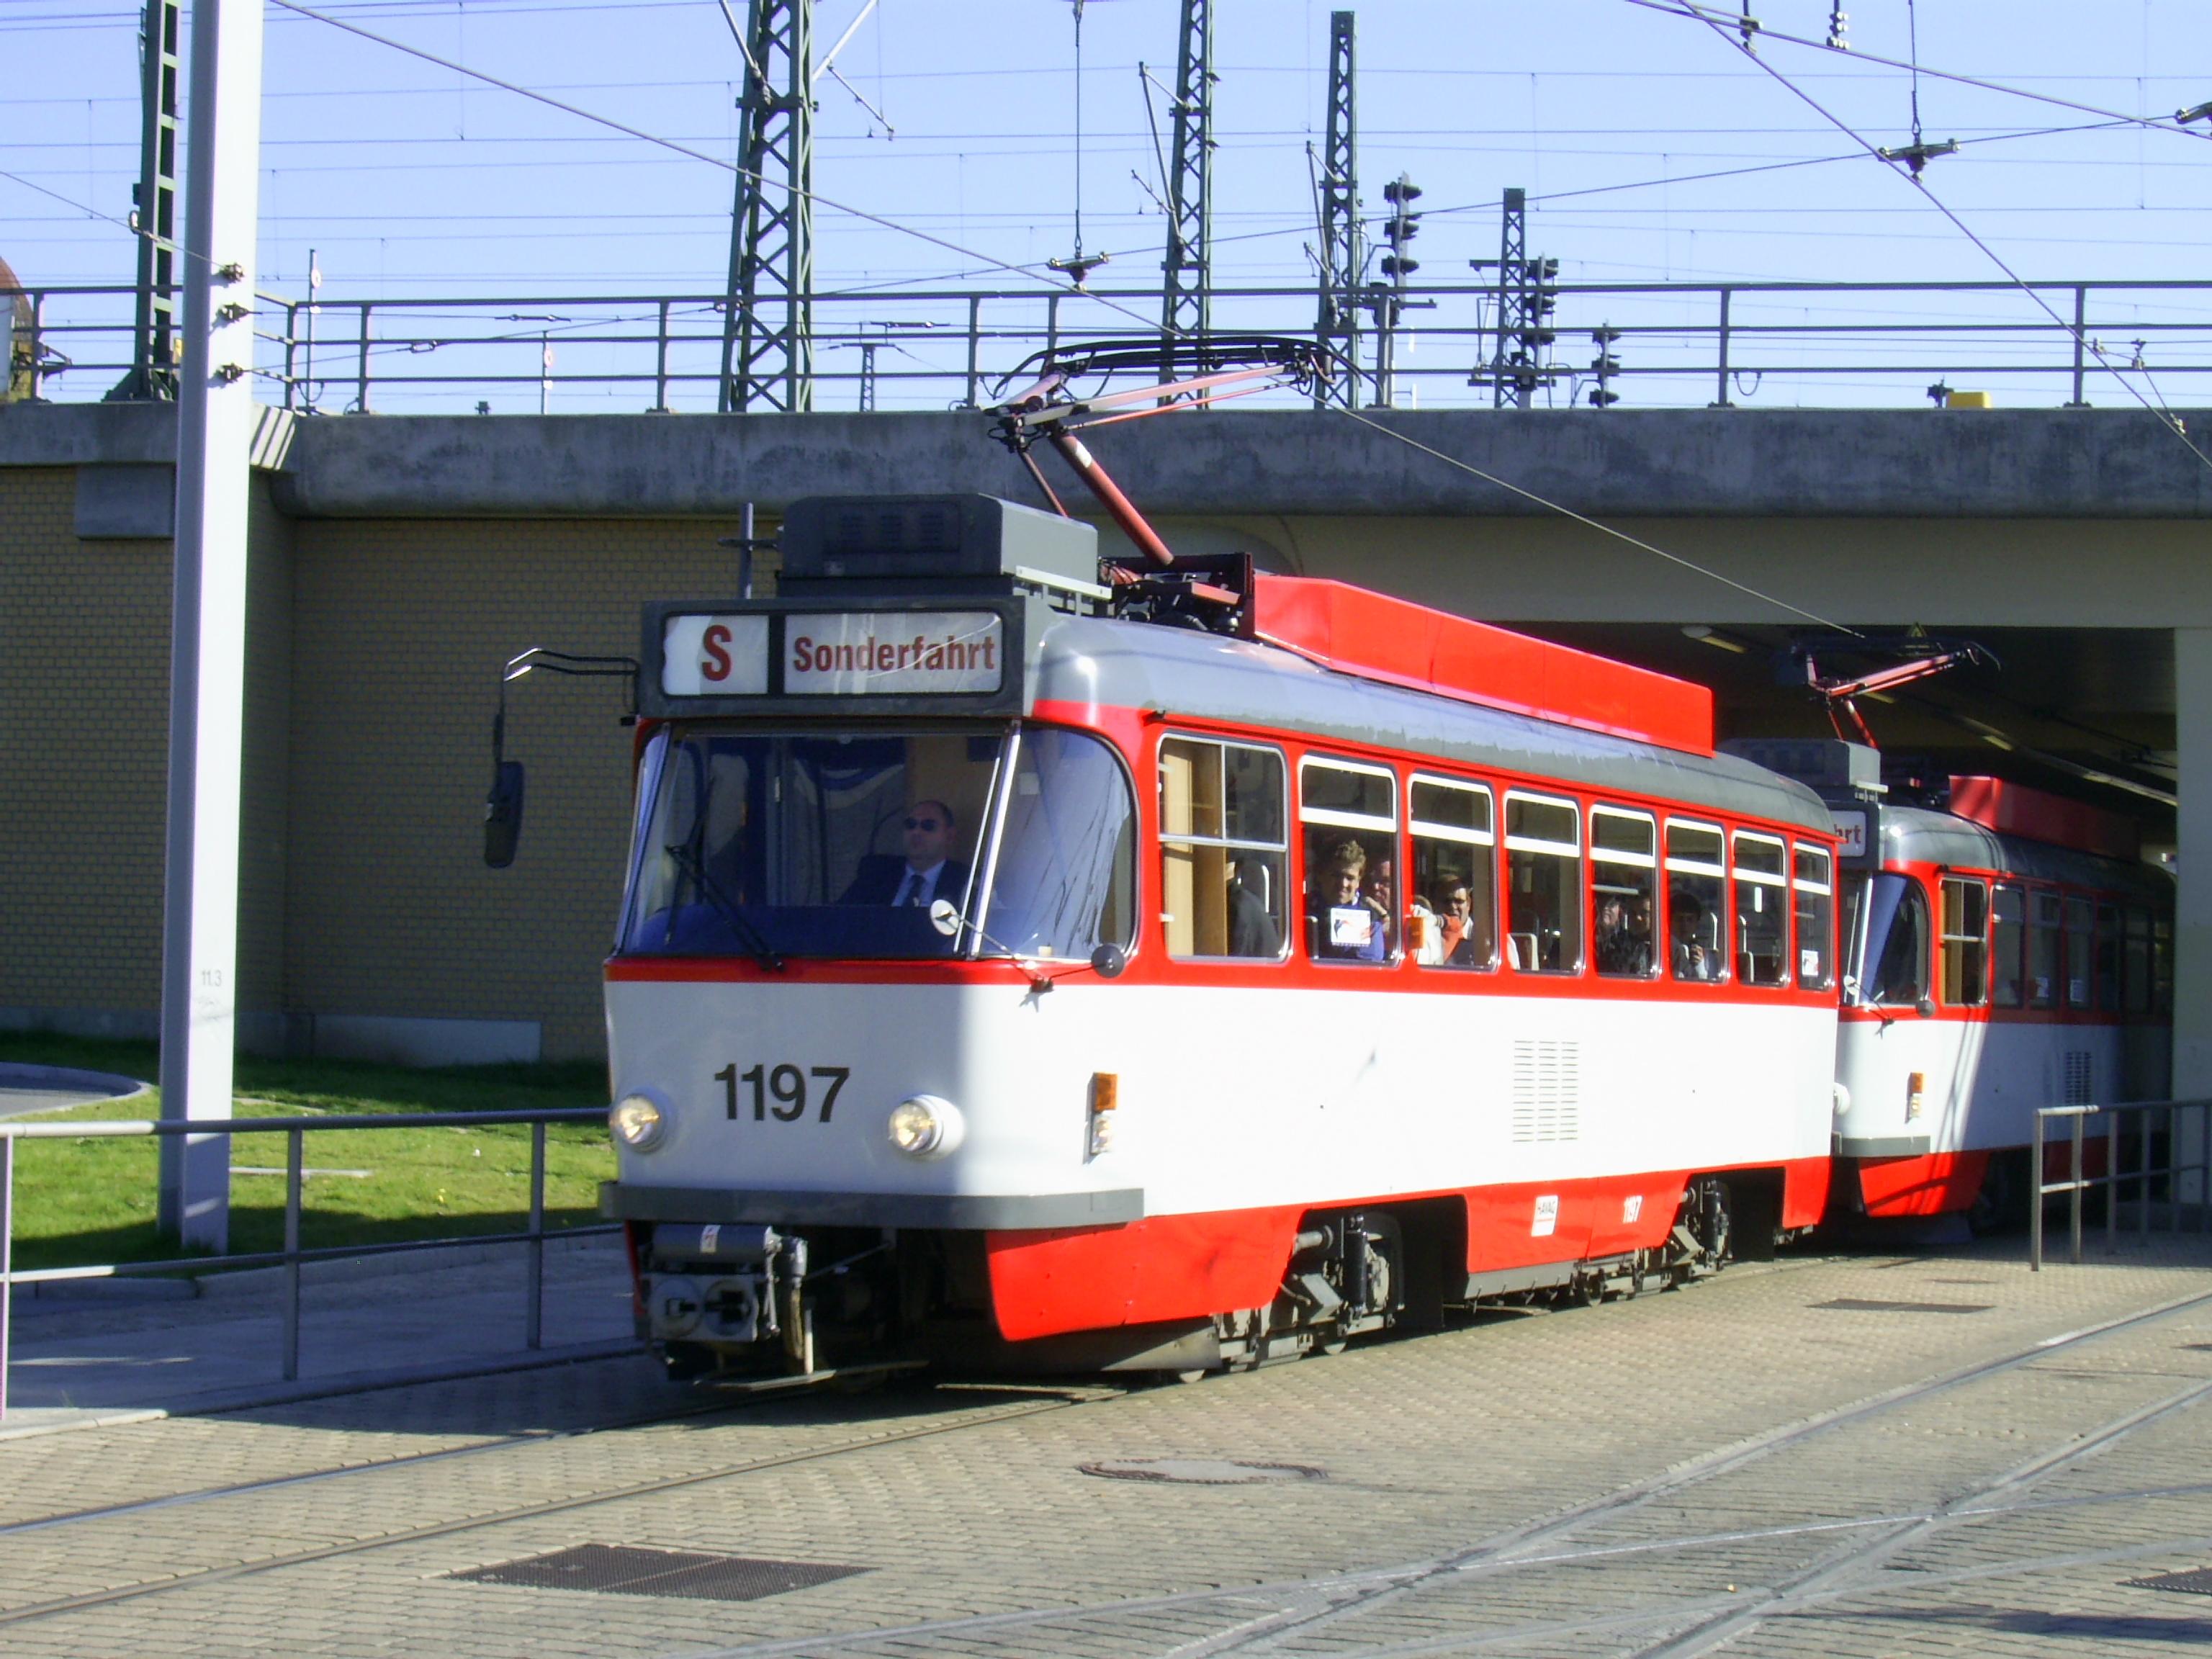 File:Strassenbahn Halle Tw 1197.JPG